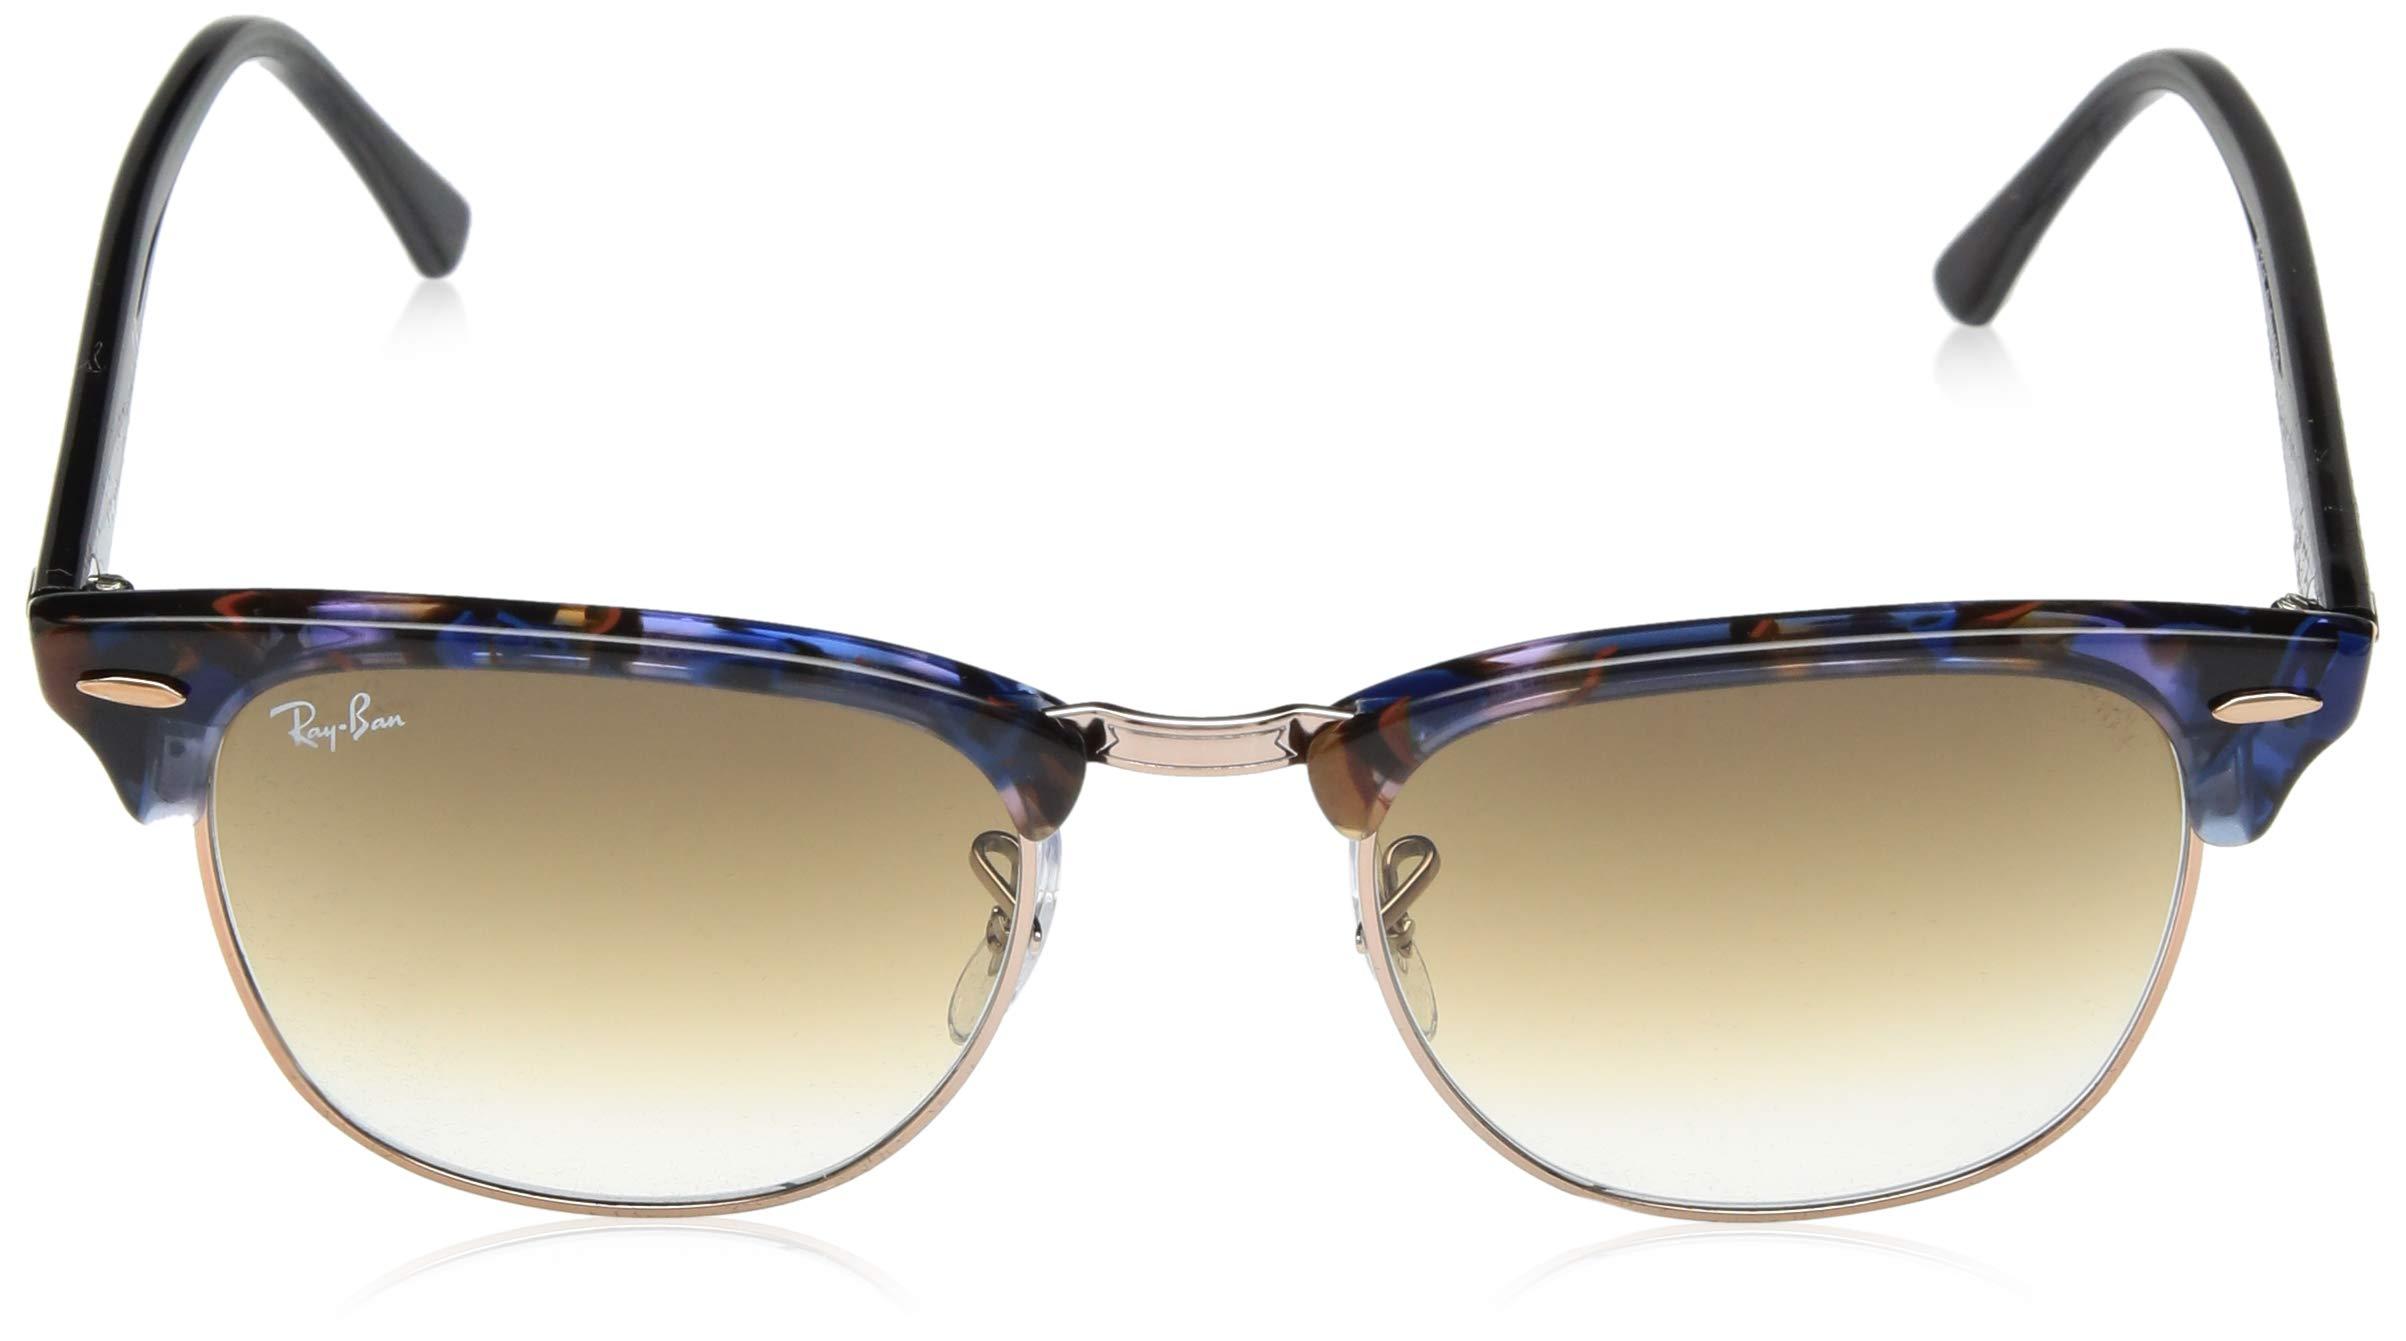 719a7fac3789f Ray-Ban-Clubmaster-Non-Polarized-Glass-Lens-Sunglasses